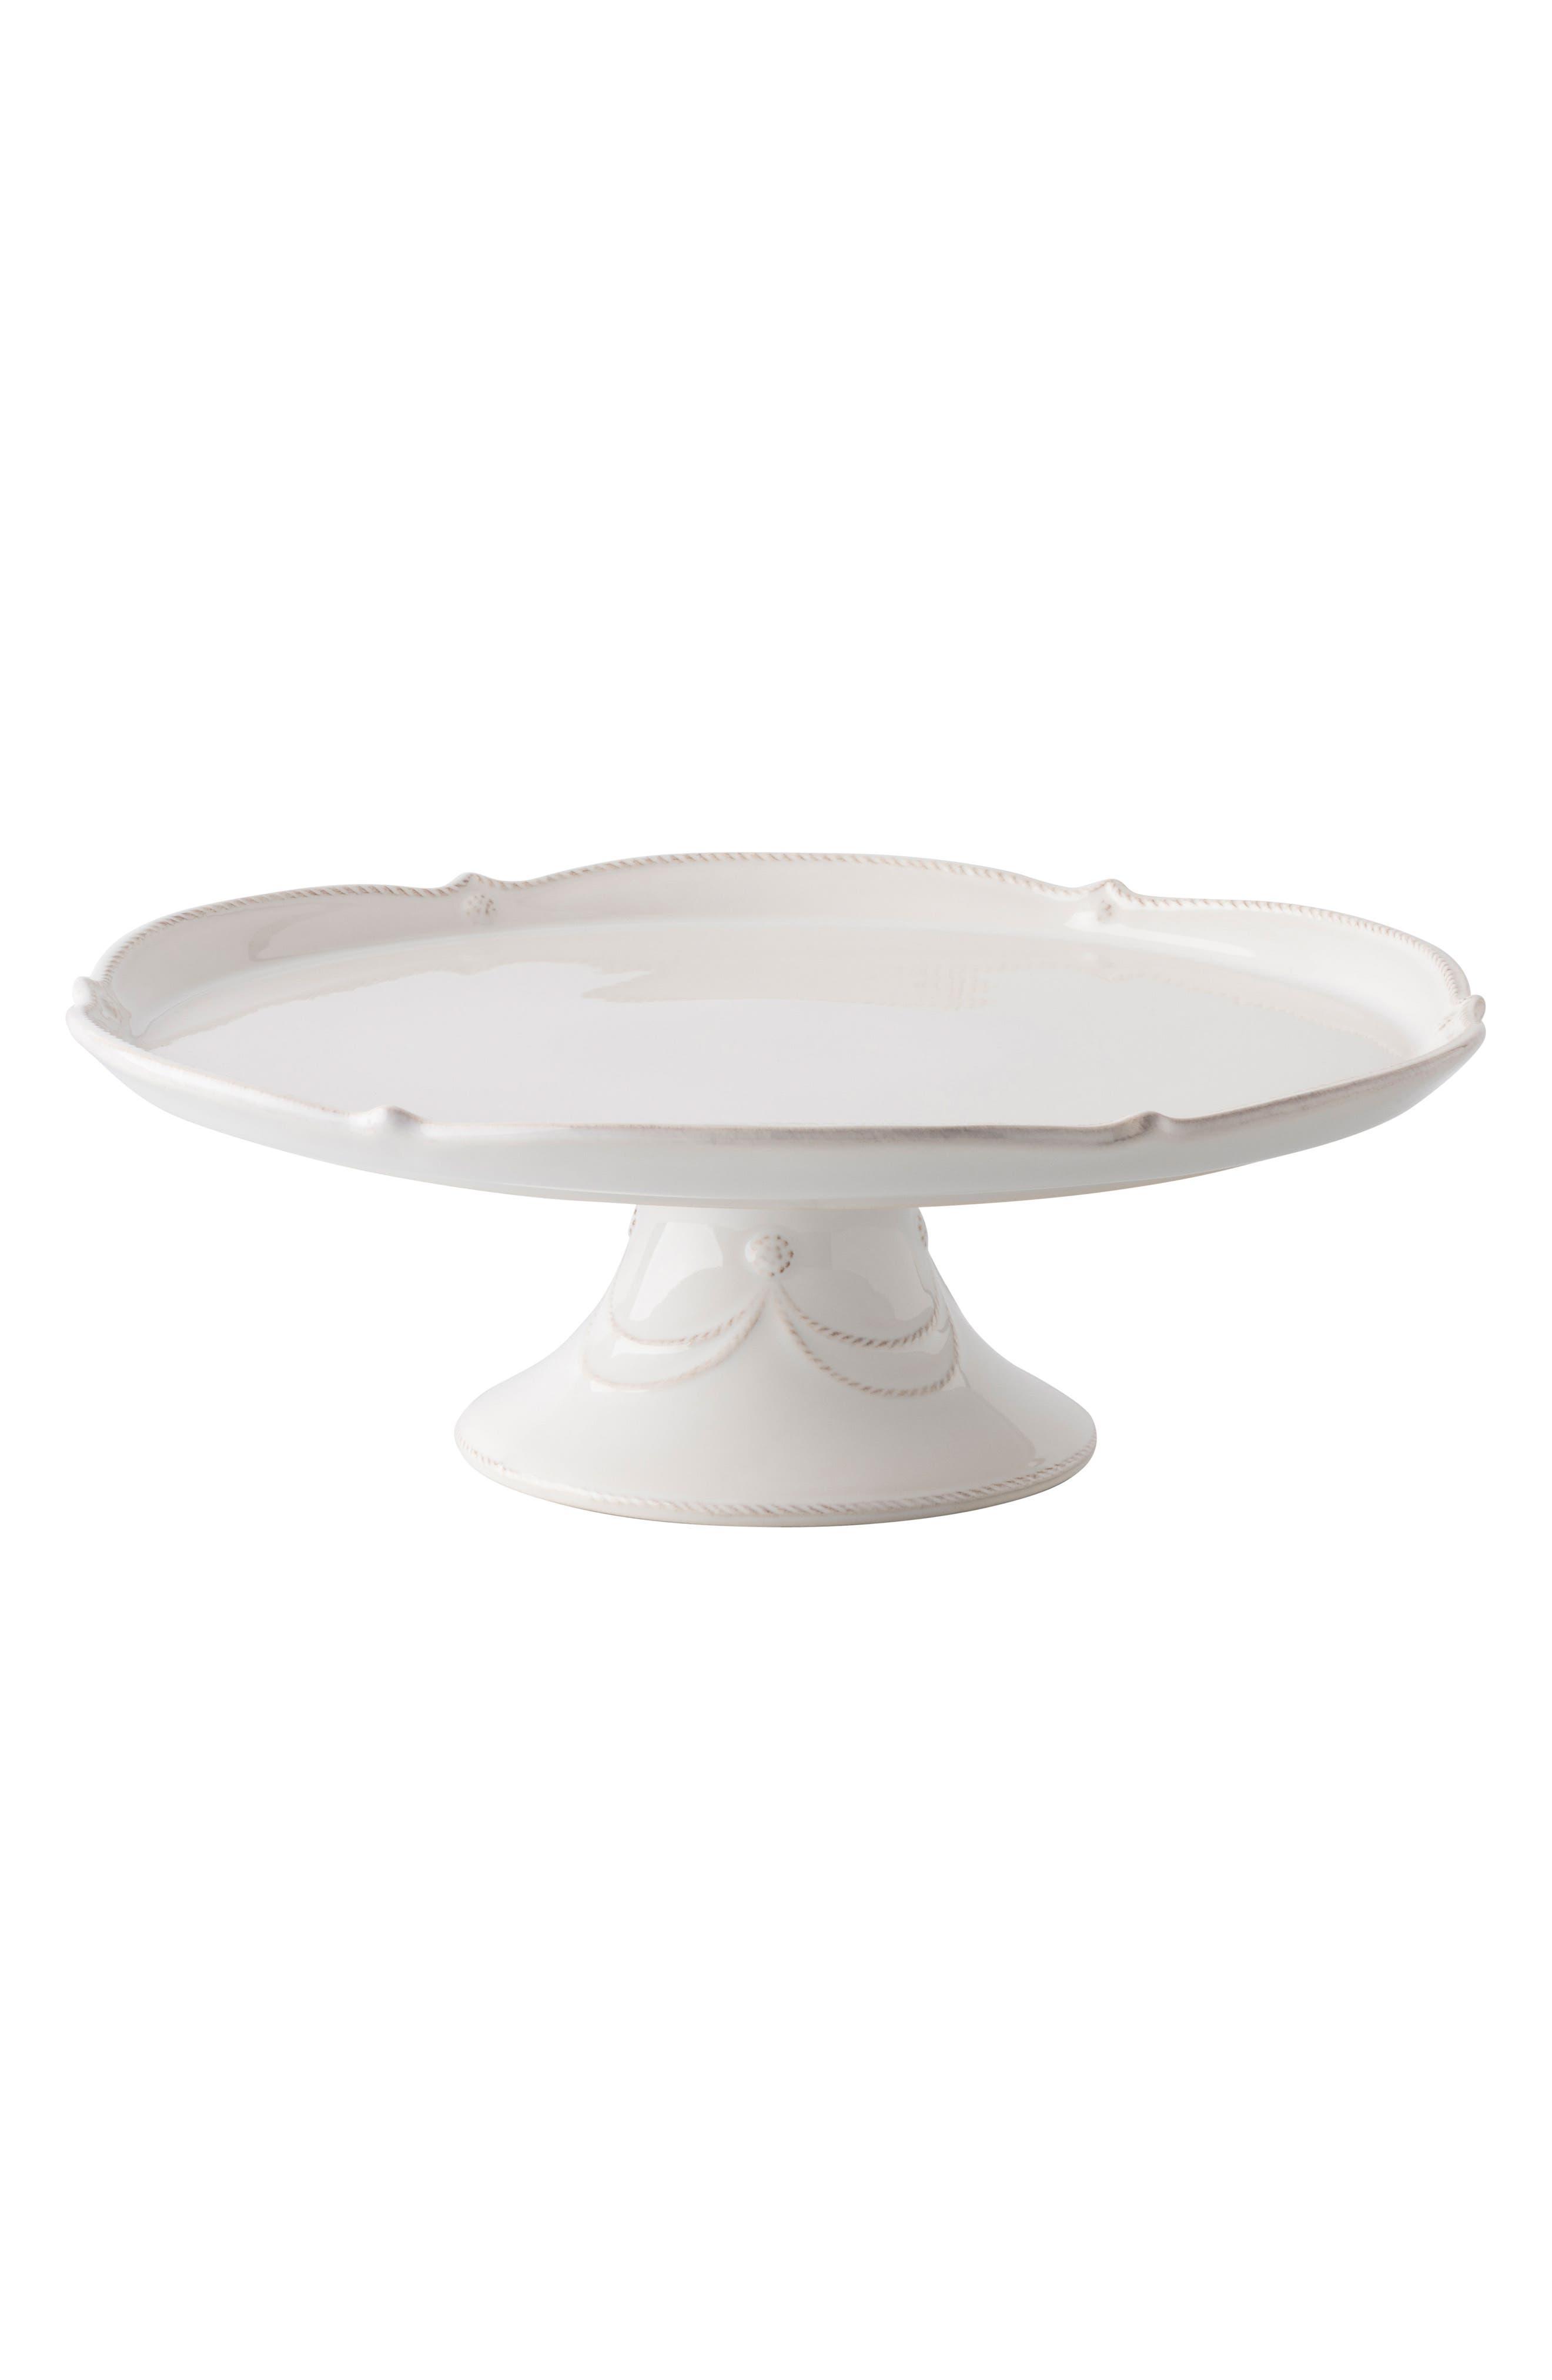 Alternate Image 1 Selected - Juliska Berry & Thread Ceramic Cake Stand